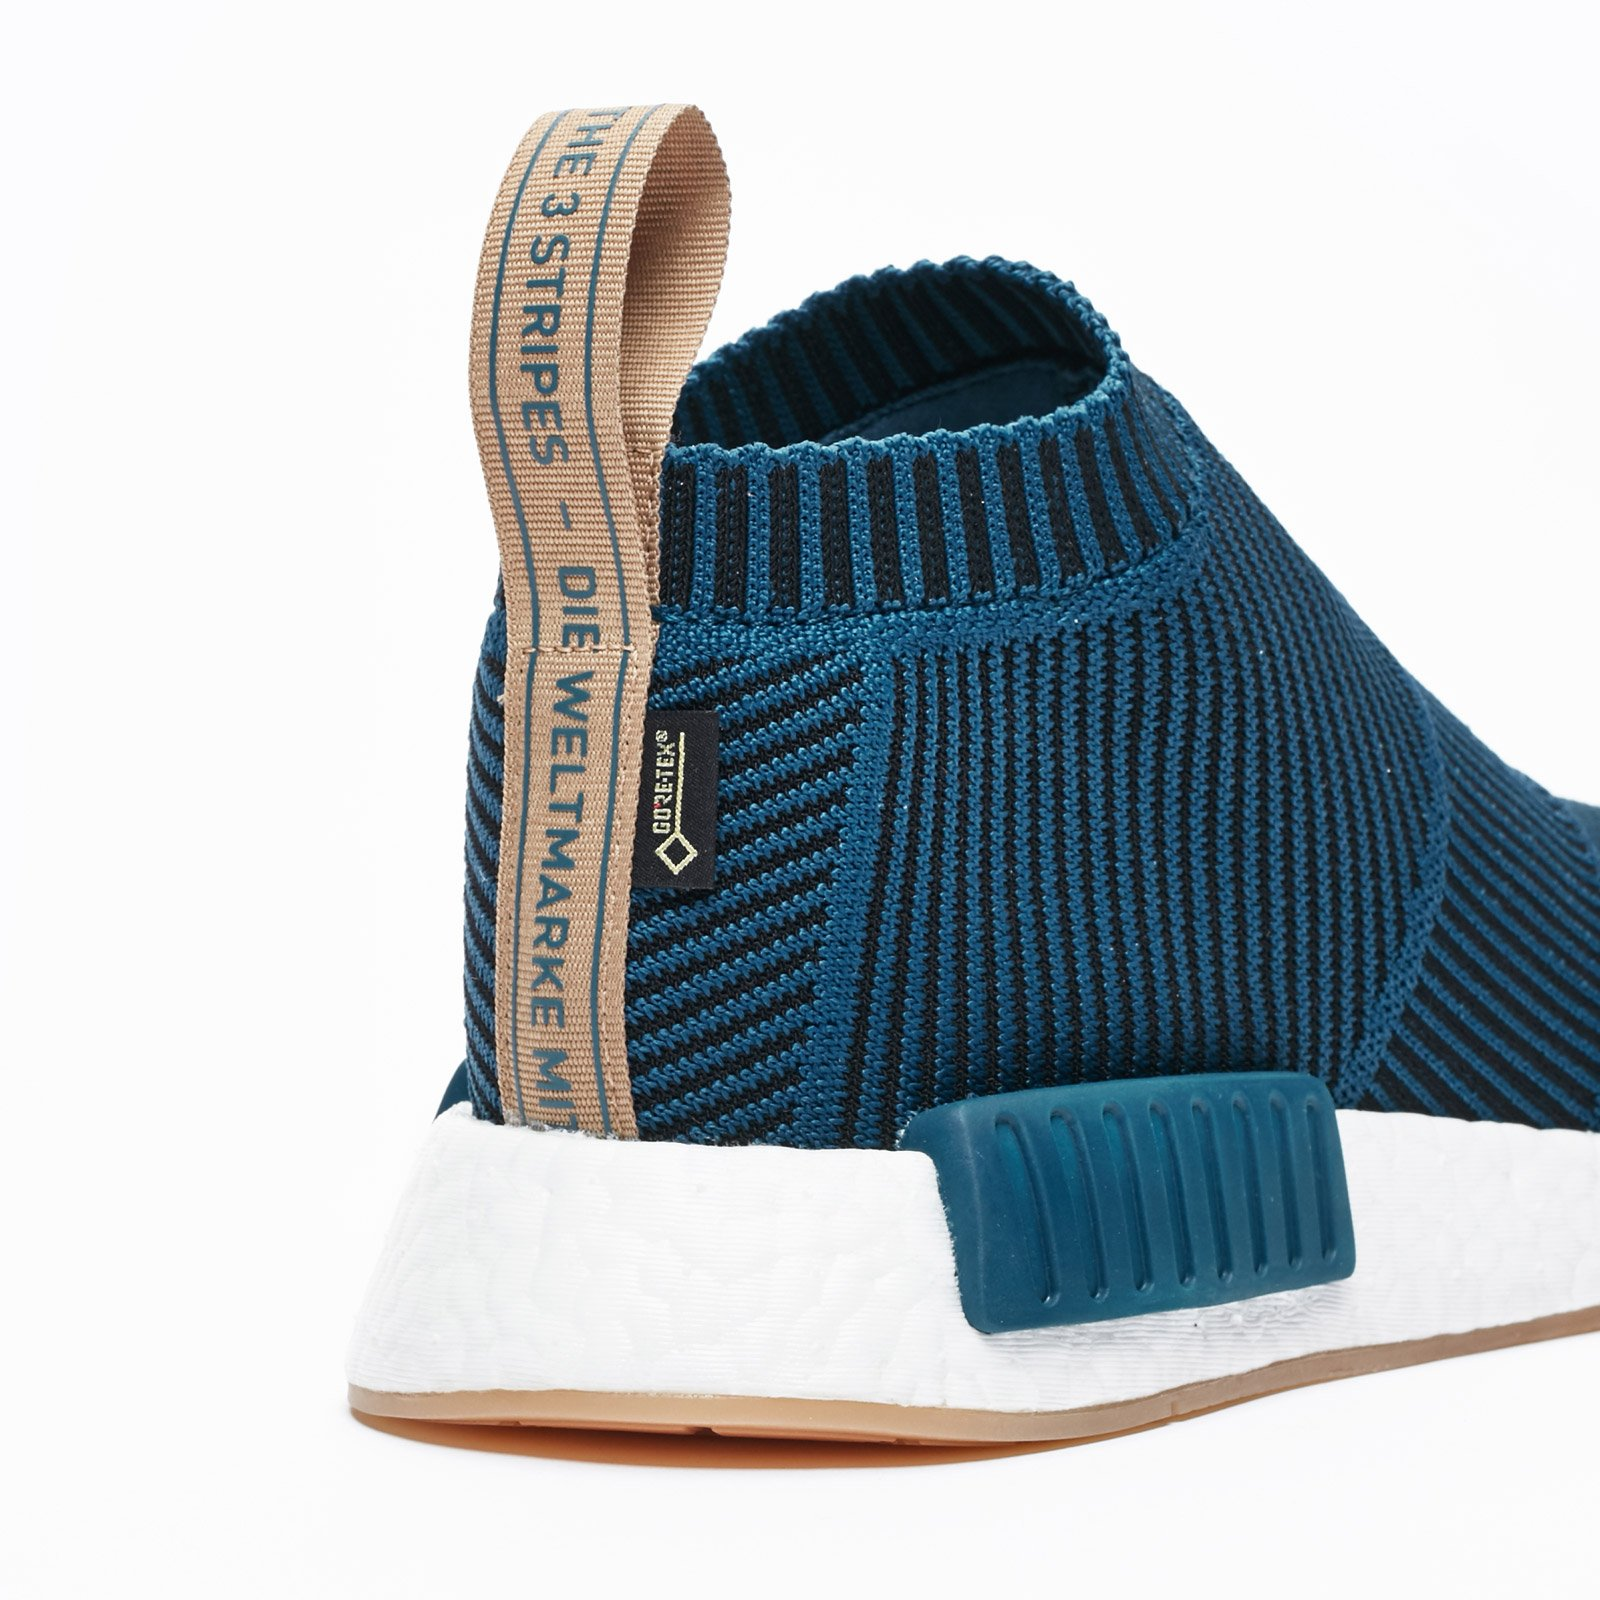 f02aecd17 adidas NMD CS1 GORE-TEX Primeknit - SNS Exclusive - Aq0363 - Sneakersnstuff